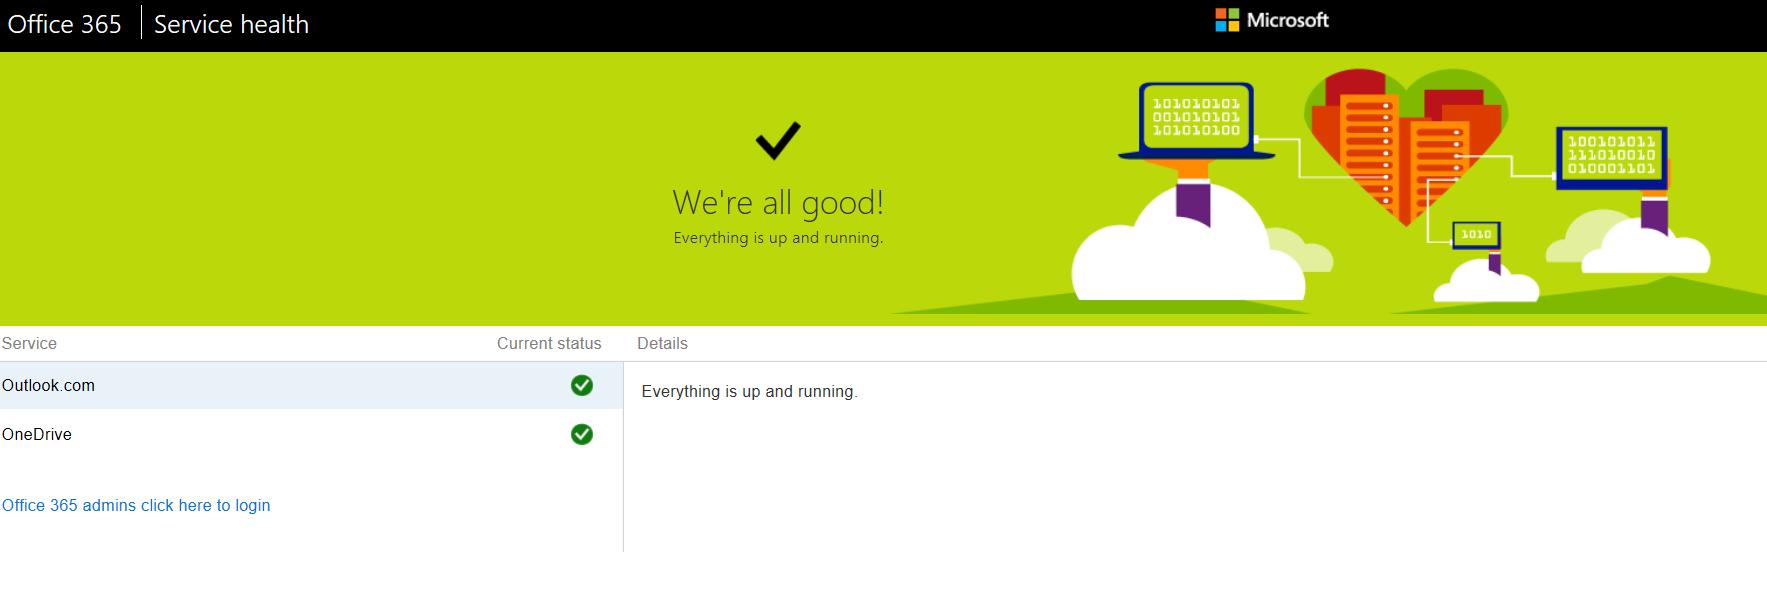 Status do Microsoft service